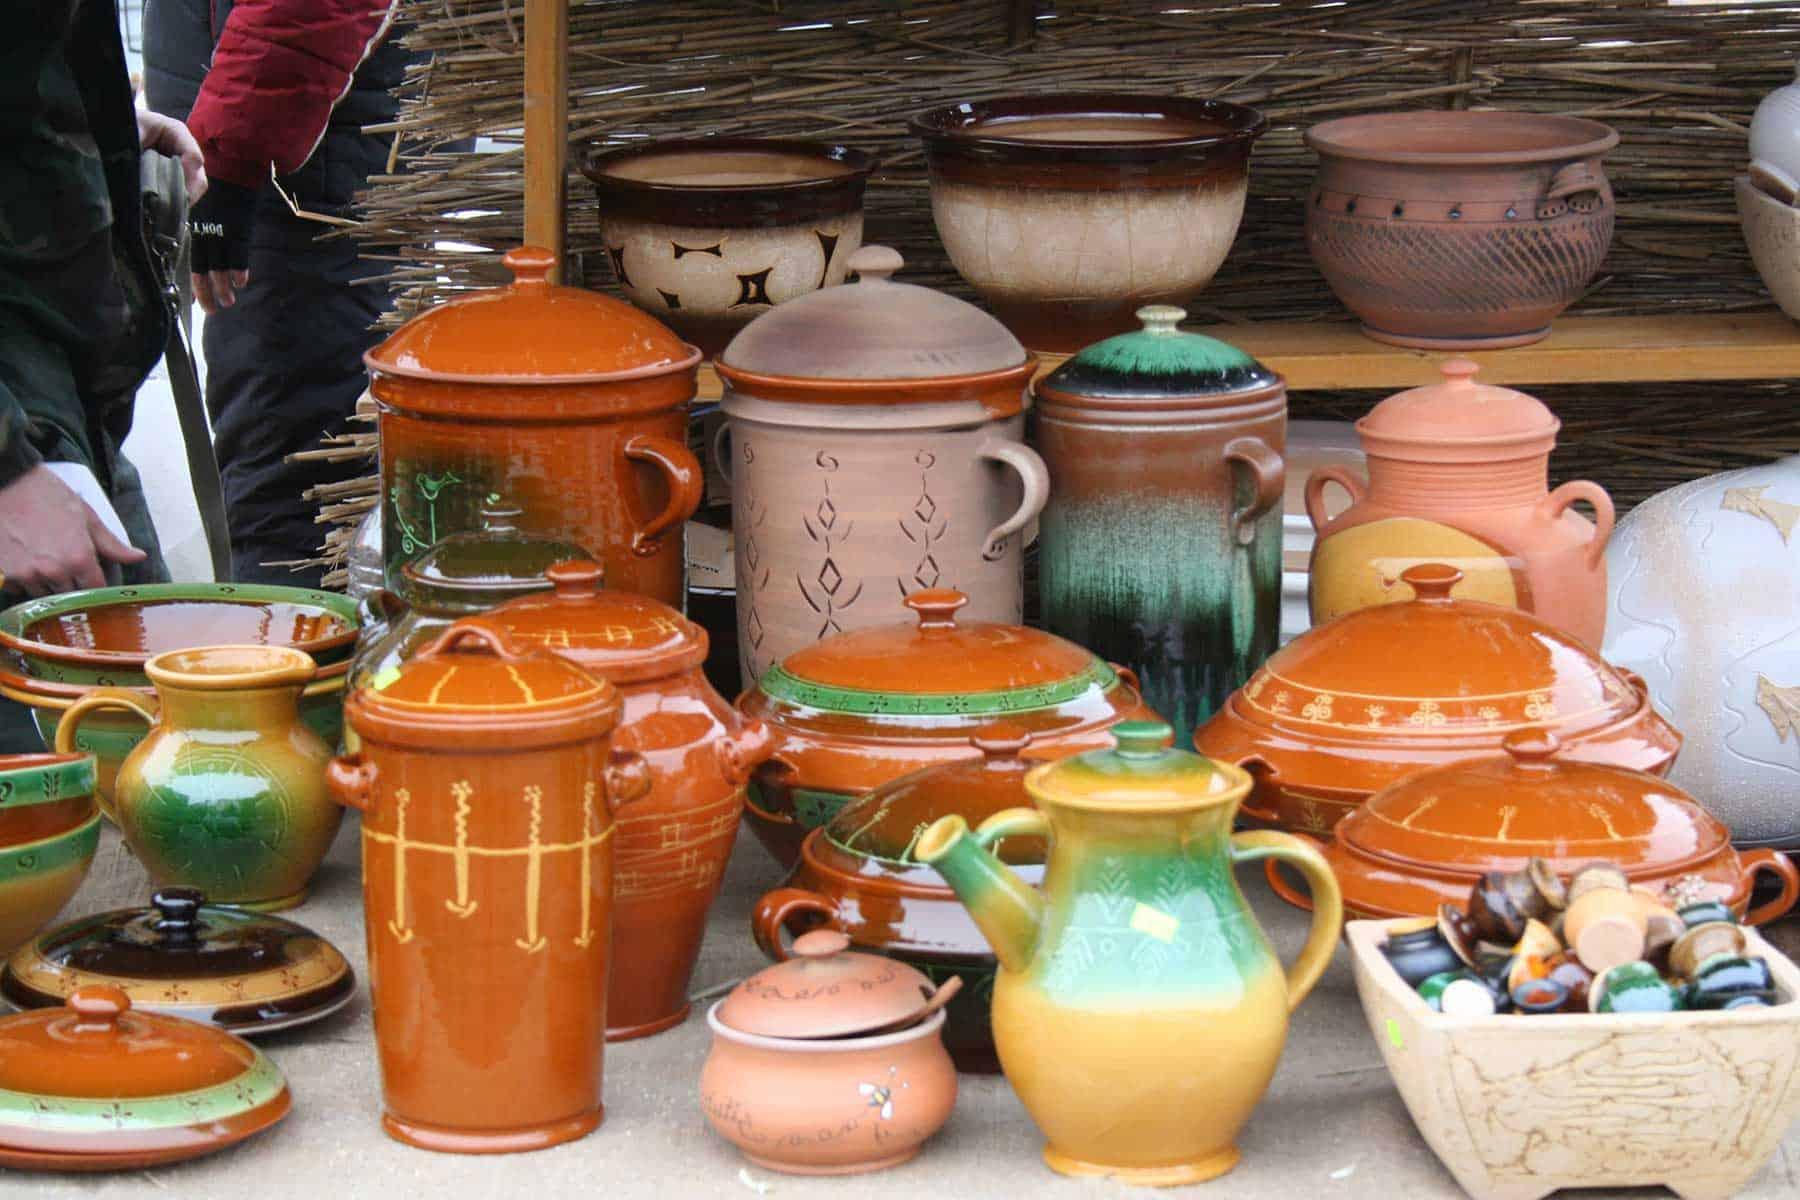 Resor_Litauen_Handmade-ceramics_nygren_lind